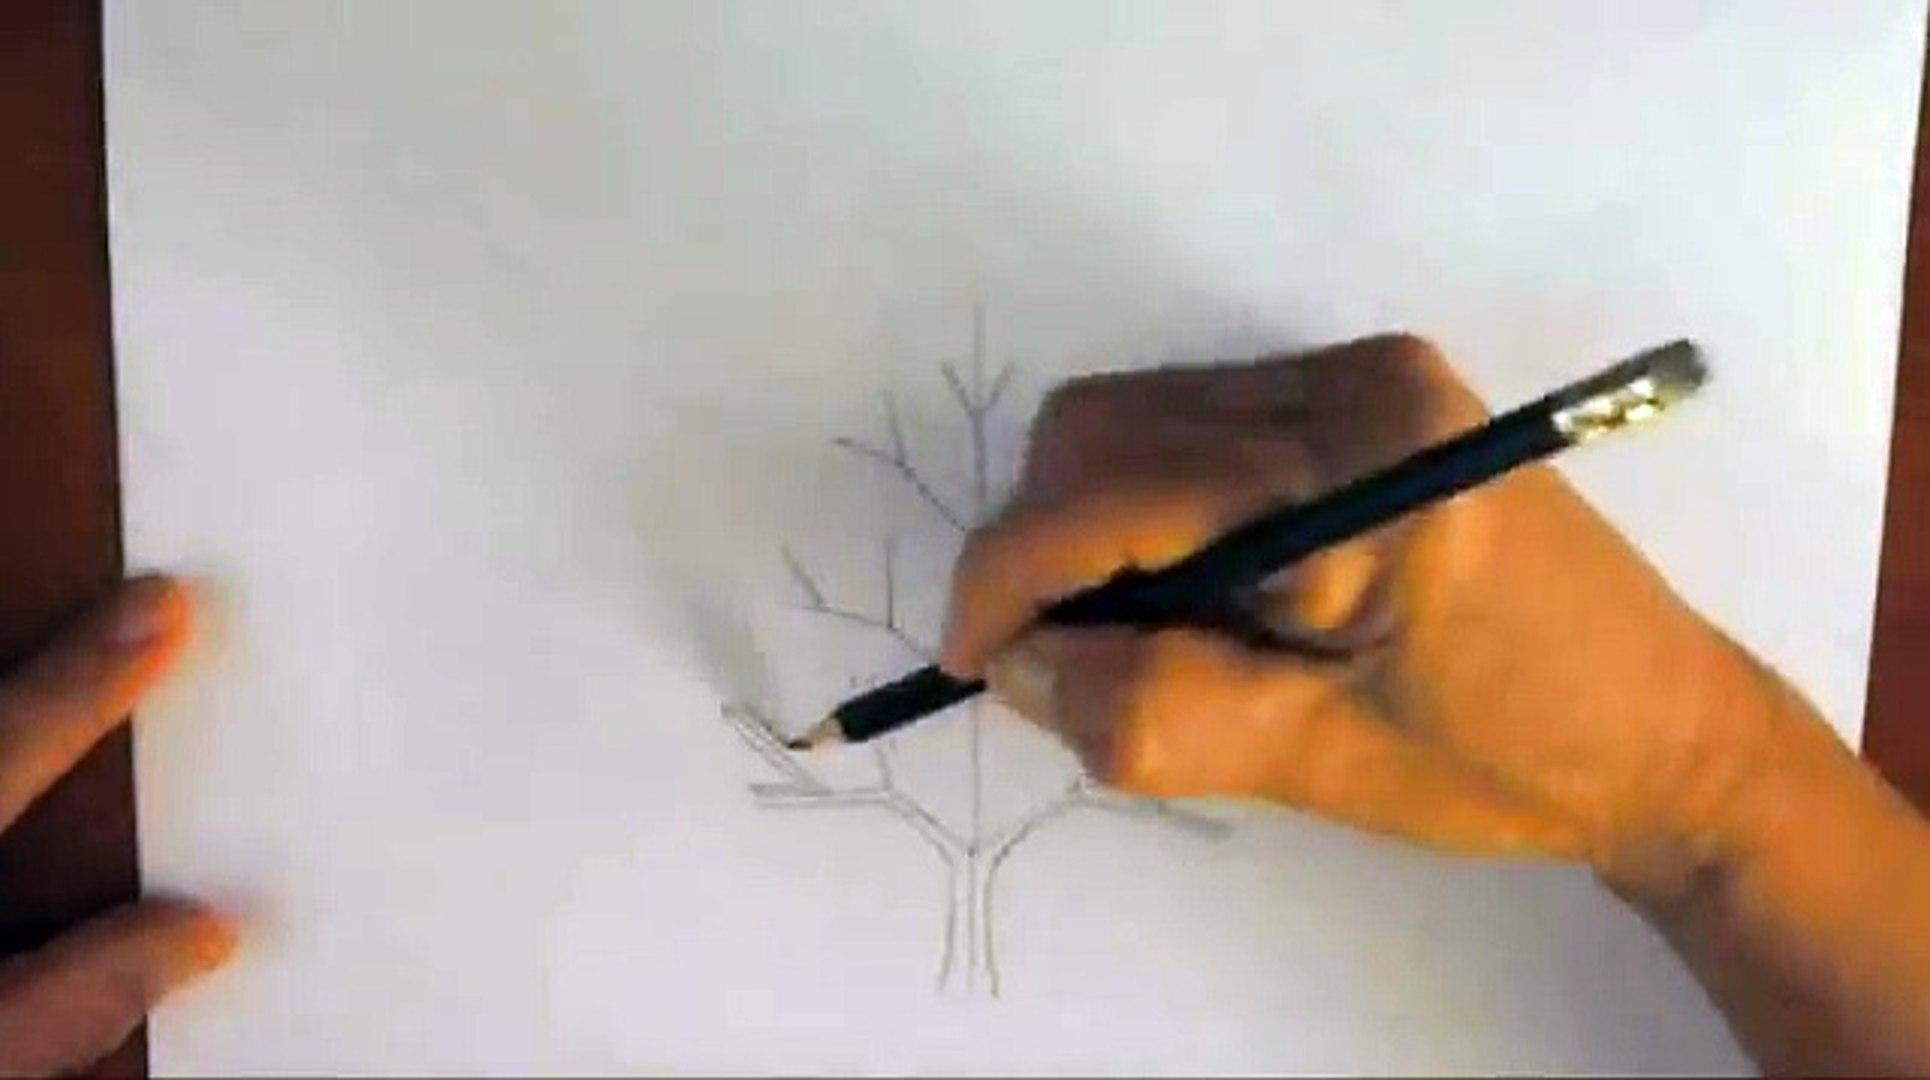 Como Dibujar Un árbol Paso A Paso Bien Fácil Bases Para Aprender A Dibujar Un Arbolito Clásico Dailymotion Video